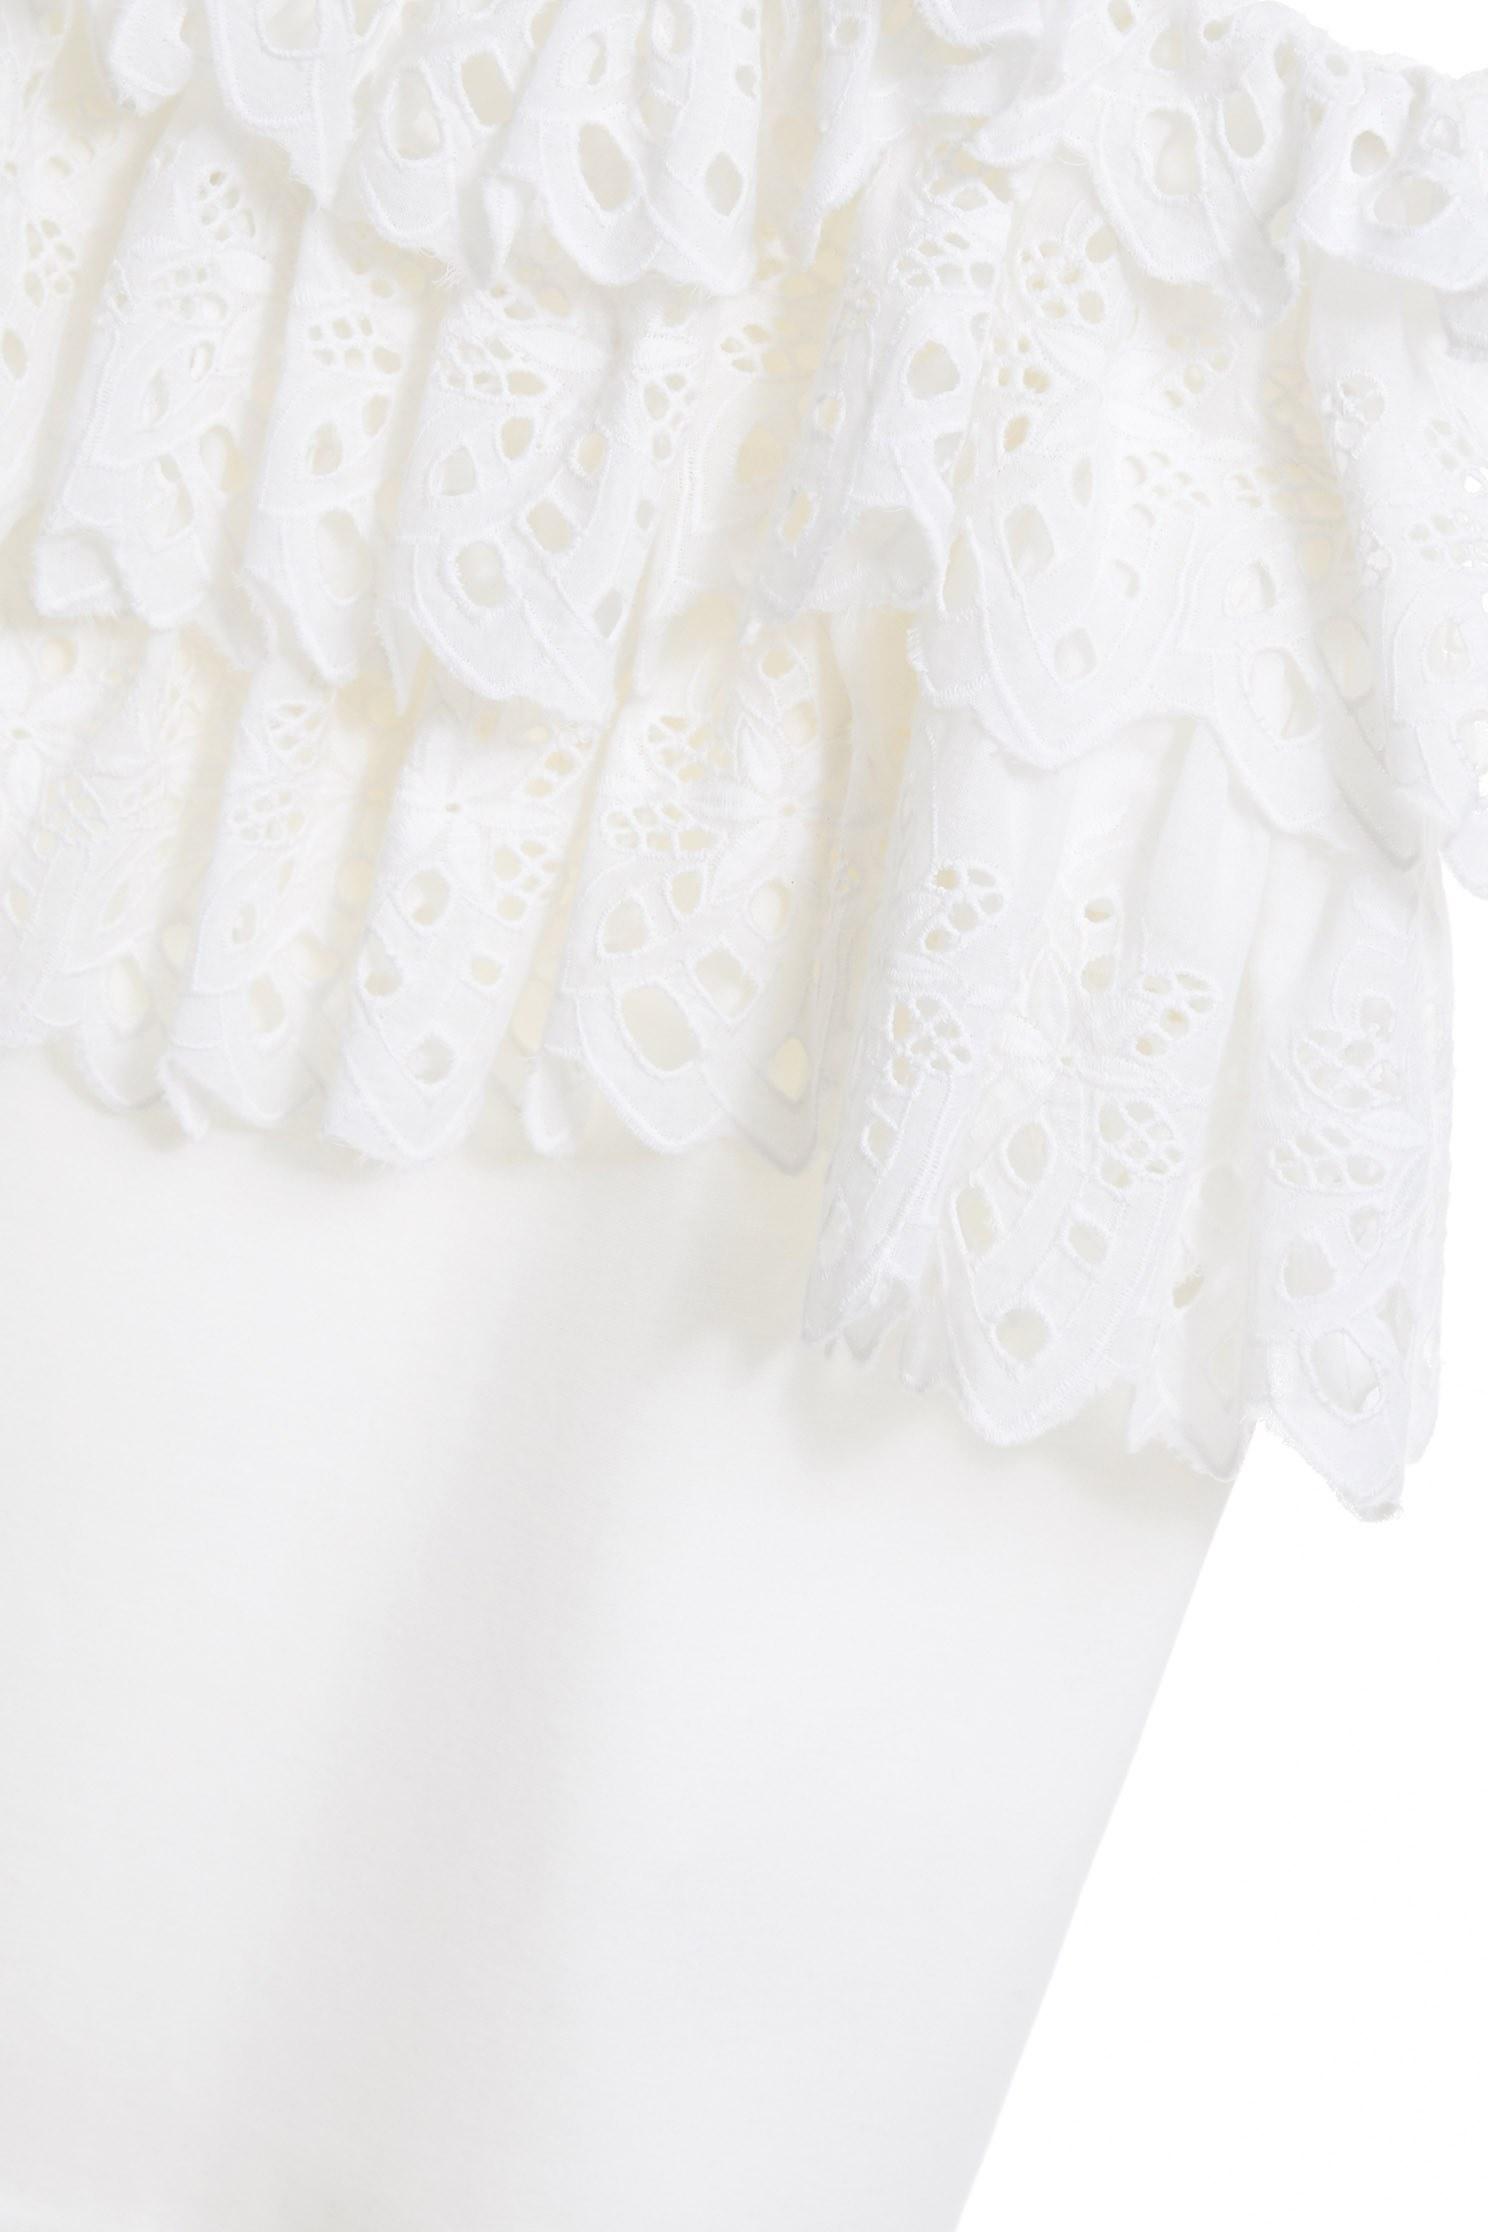 Off-the-shoulder ruffle set (pants),onlinelimitededition,culottespants,pants